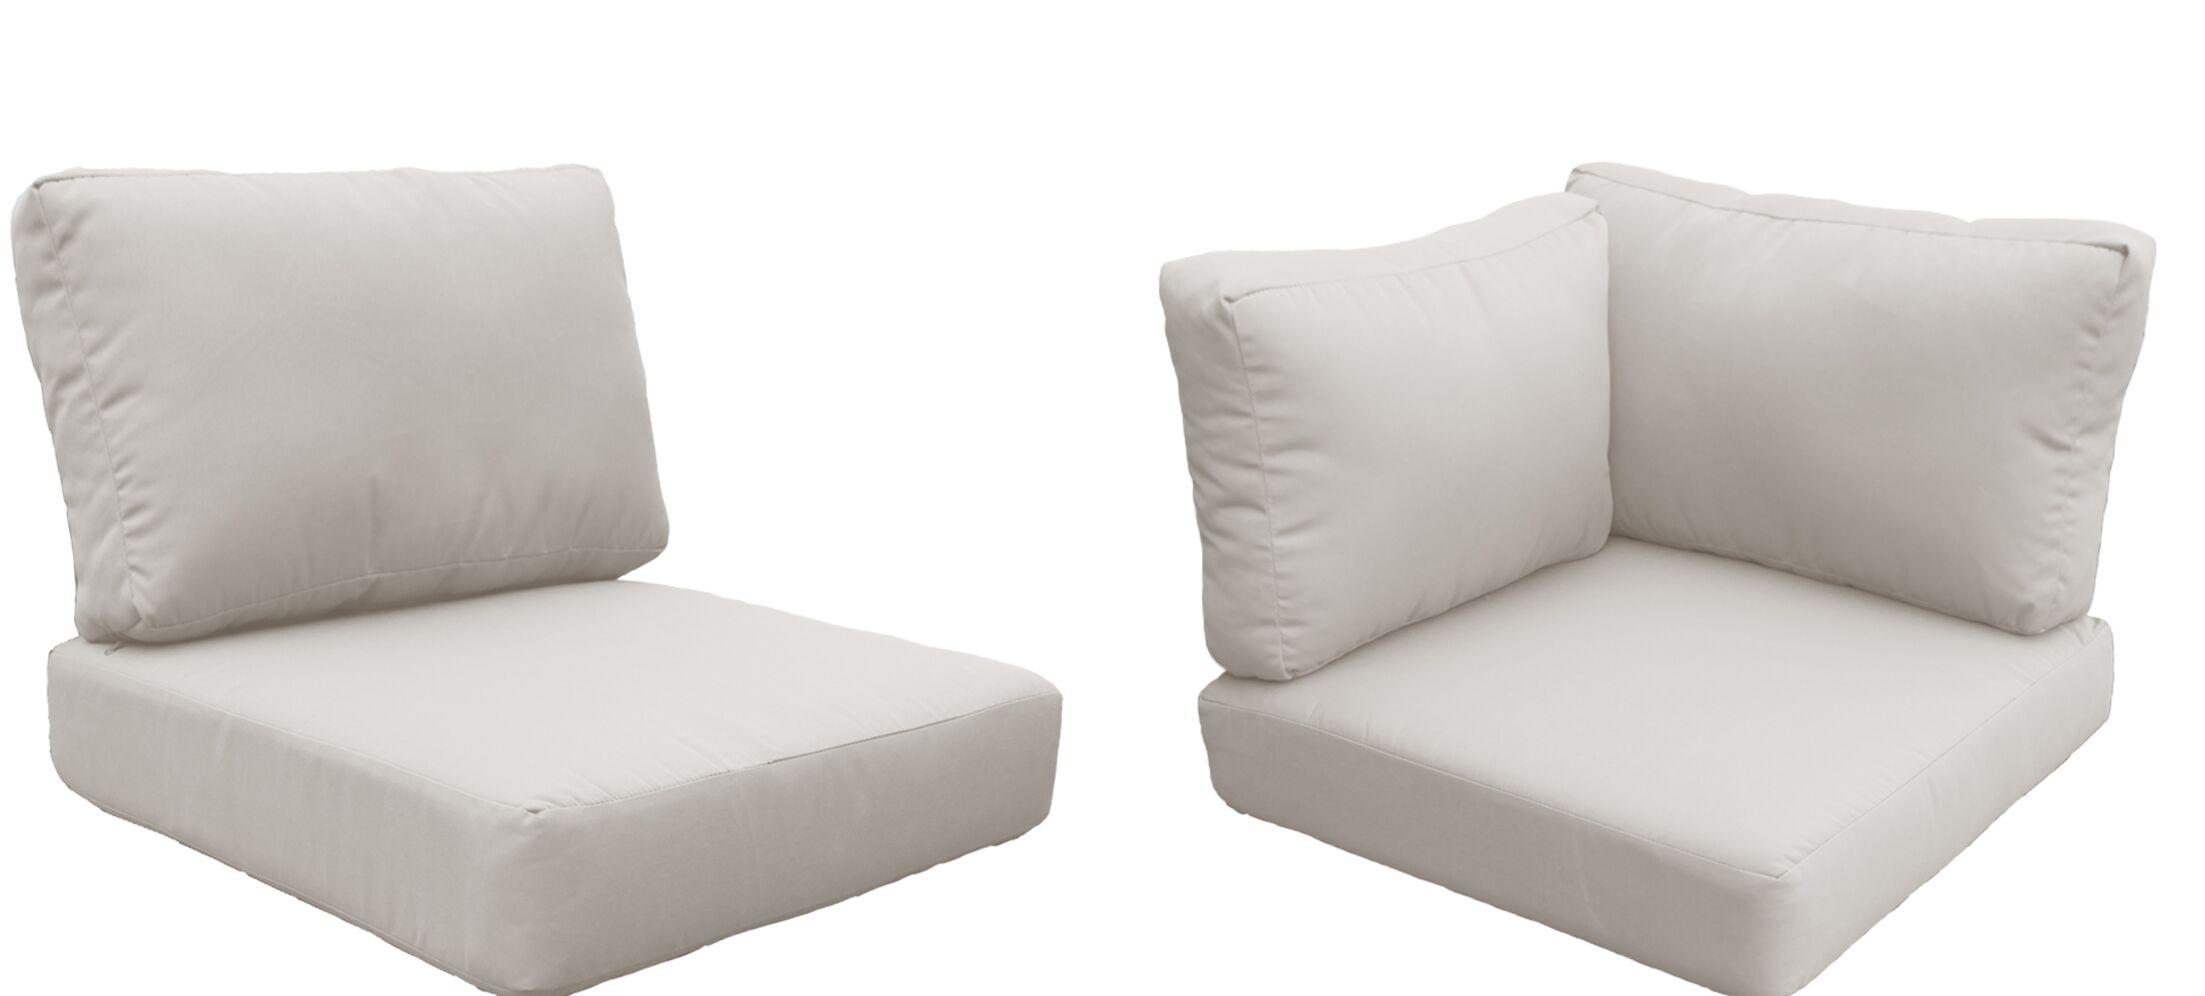 Eldredge Outdoor 15 Piece Lounge Chair Cushion Set Fabric: Beige